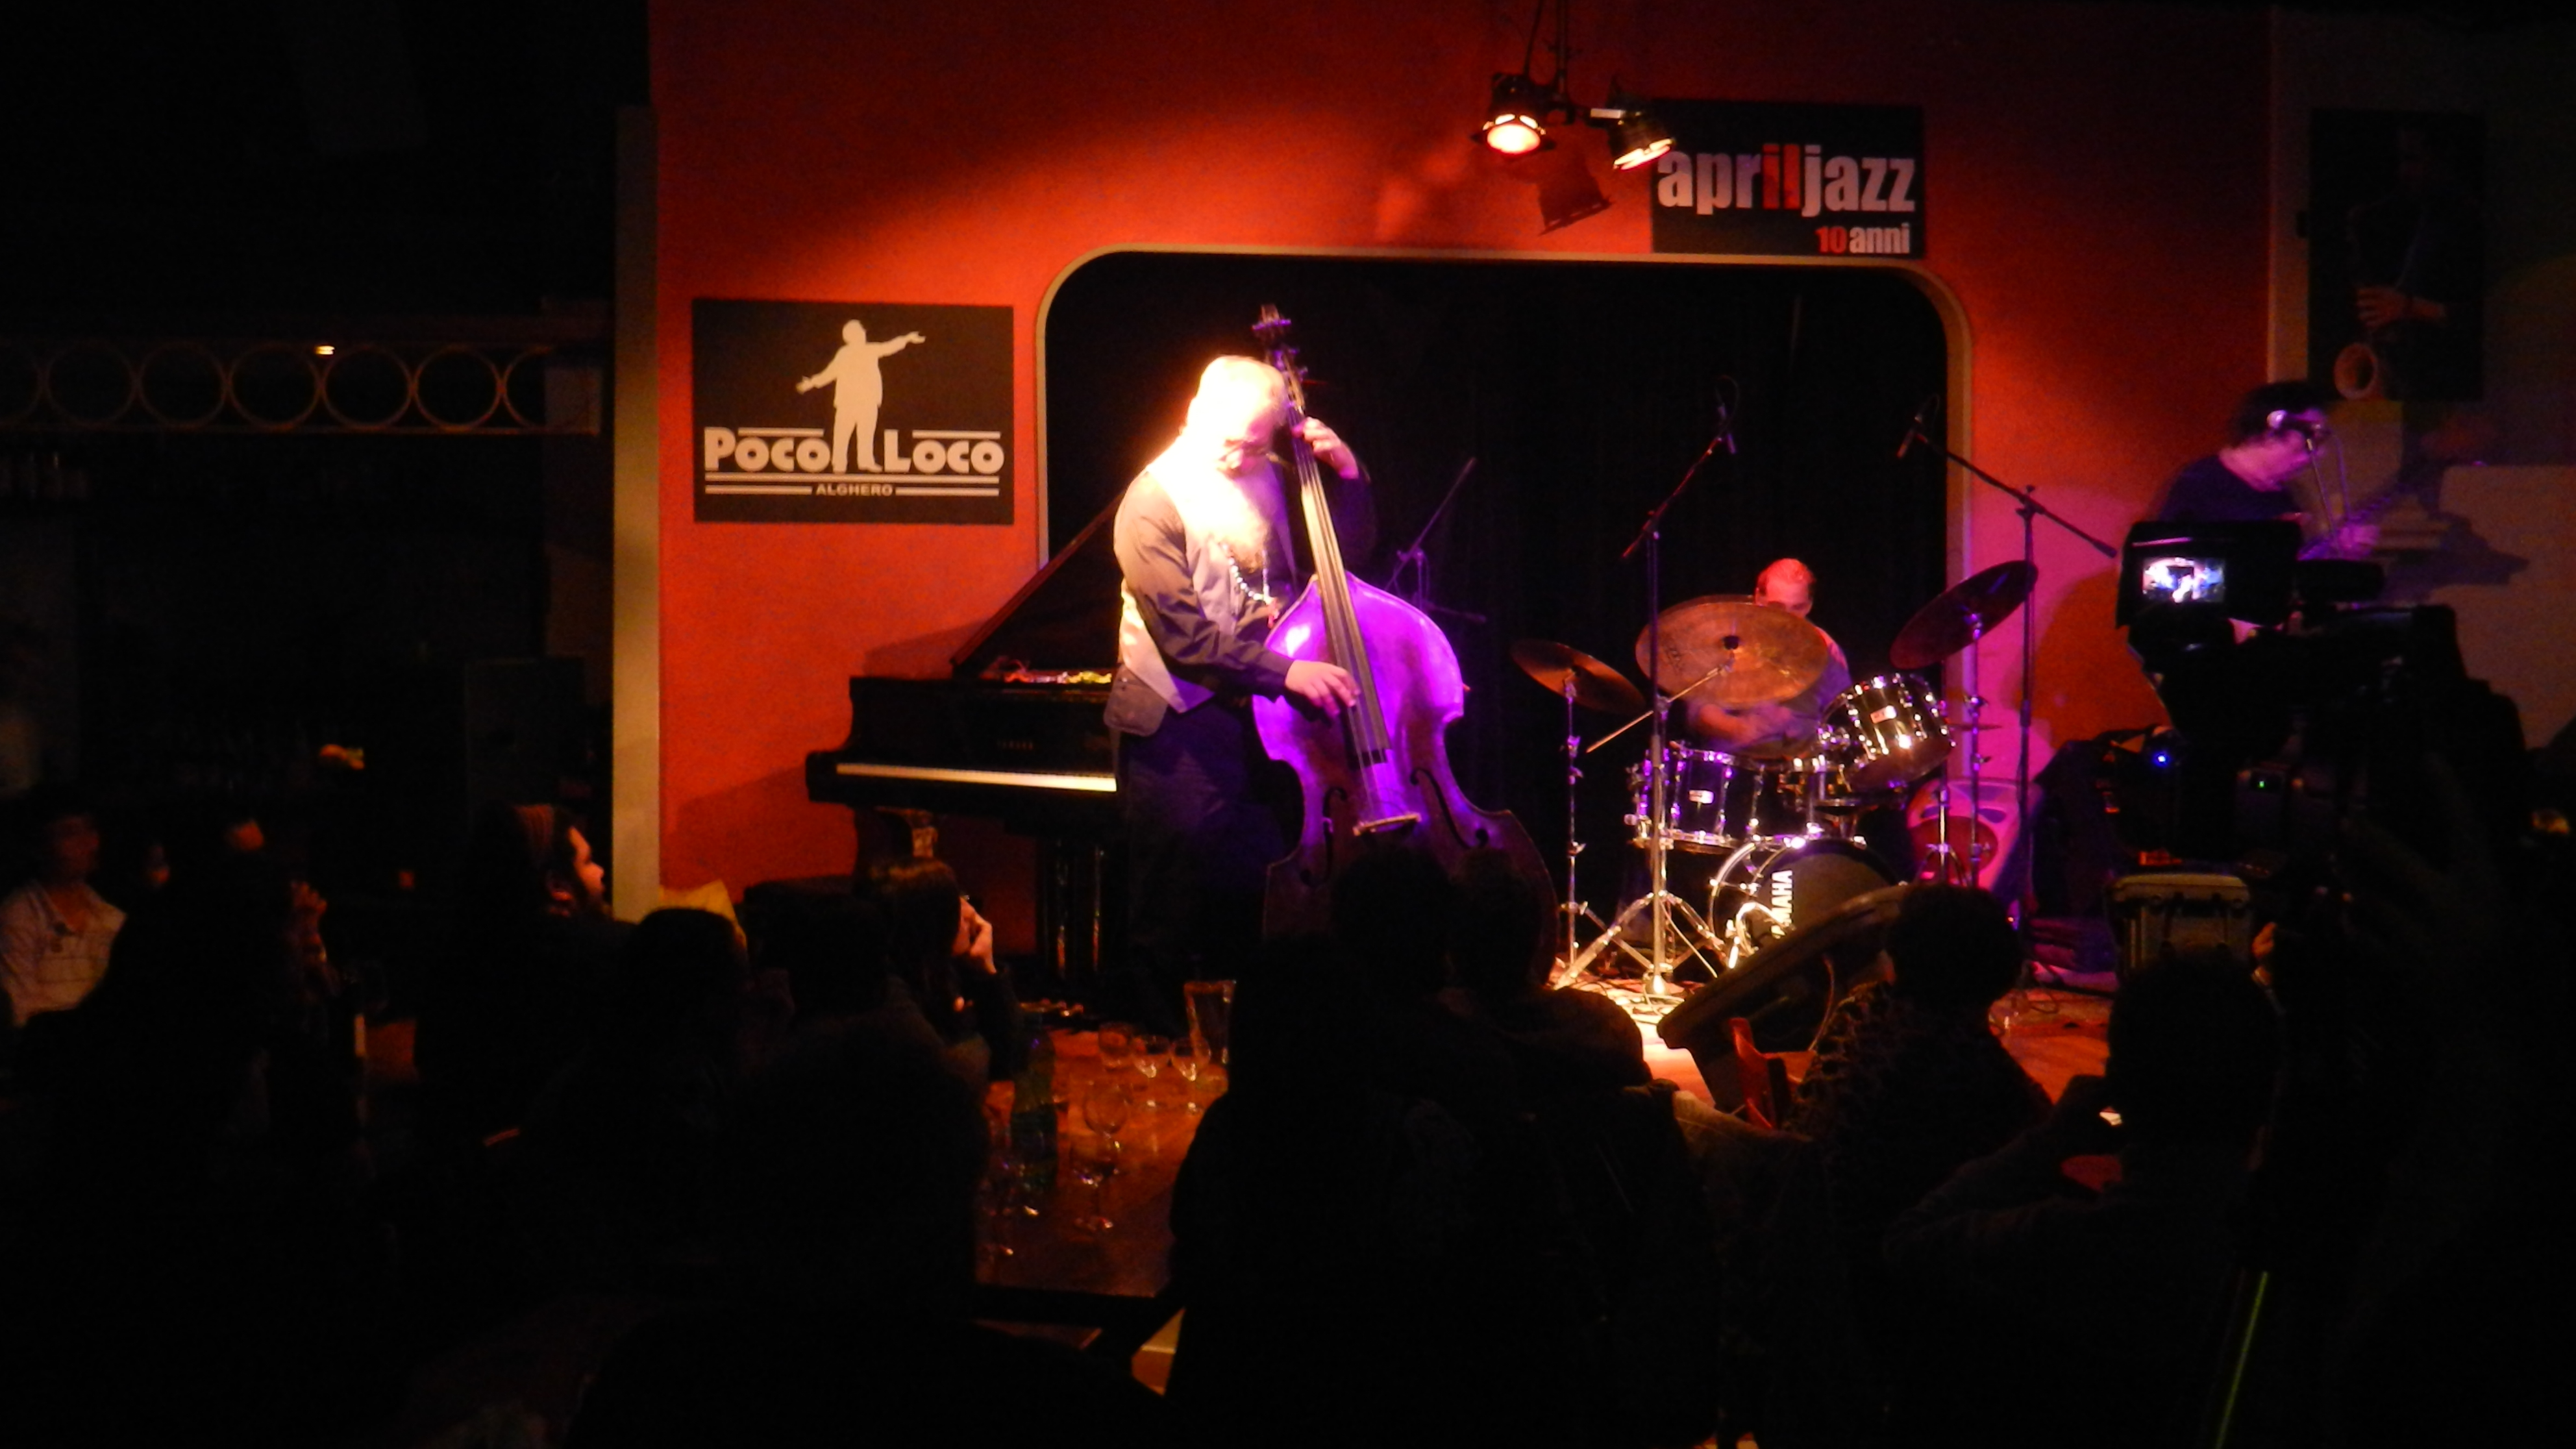 Jeff Berlin trio - April Jazz Poco Loco club Alghero Pizzeria Griglieria Poco Loco Alghero